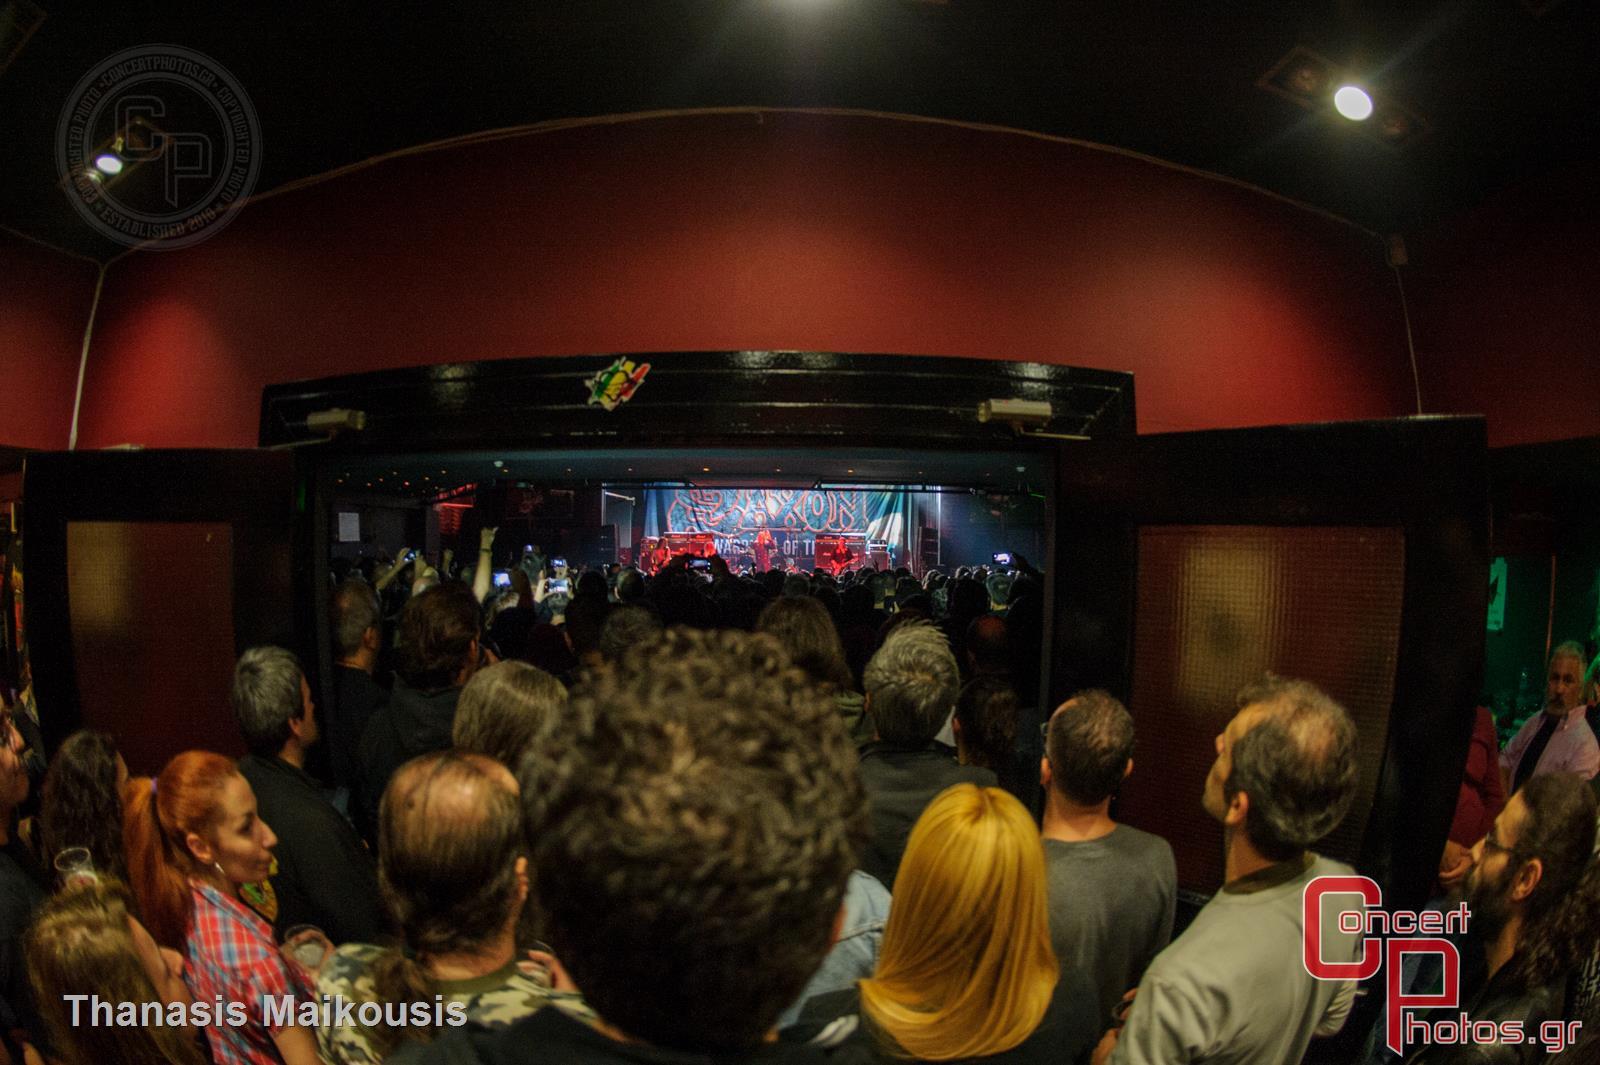 Saxon & Innerwish -Saxon Innerwish Gagarin photographer: Thanasis Maikousis - concertphotos_20141025_23_24_22